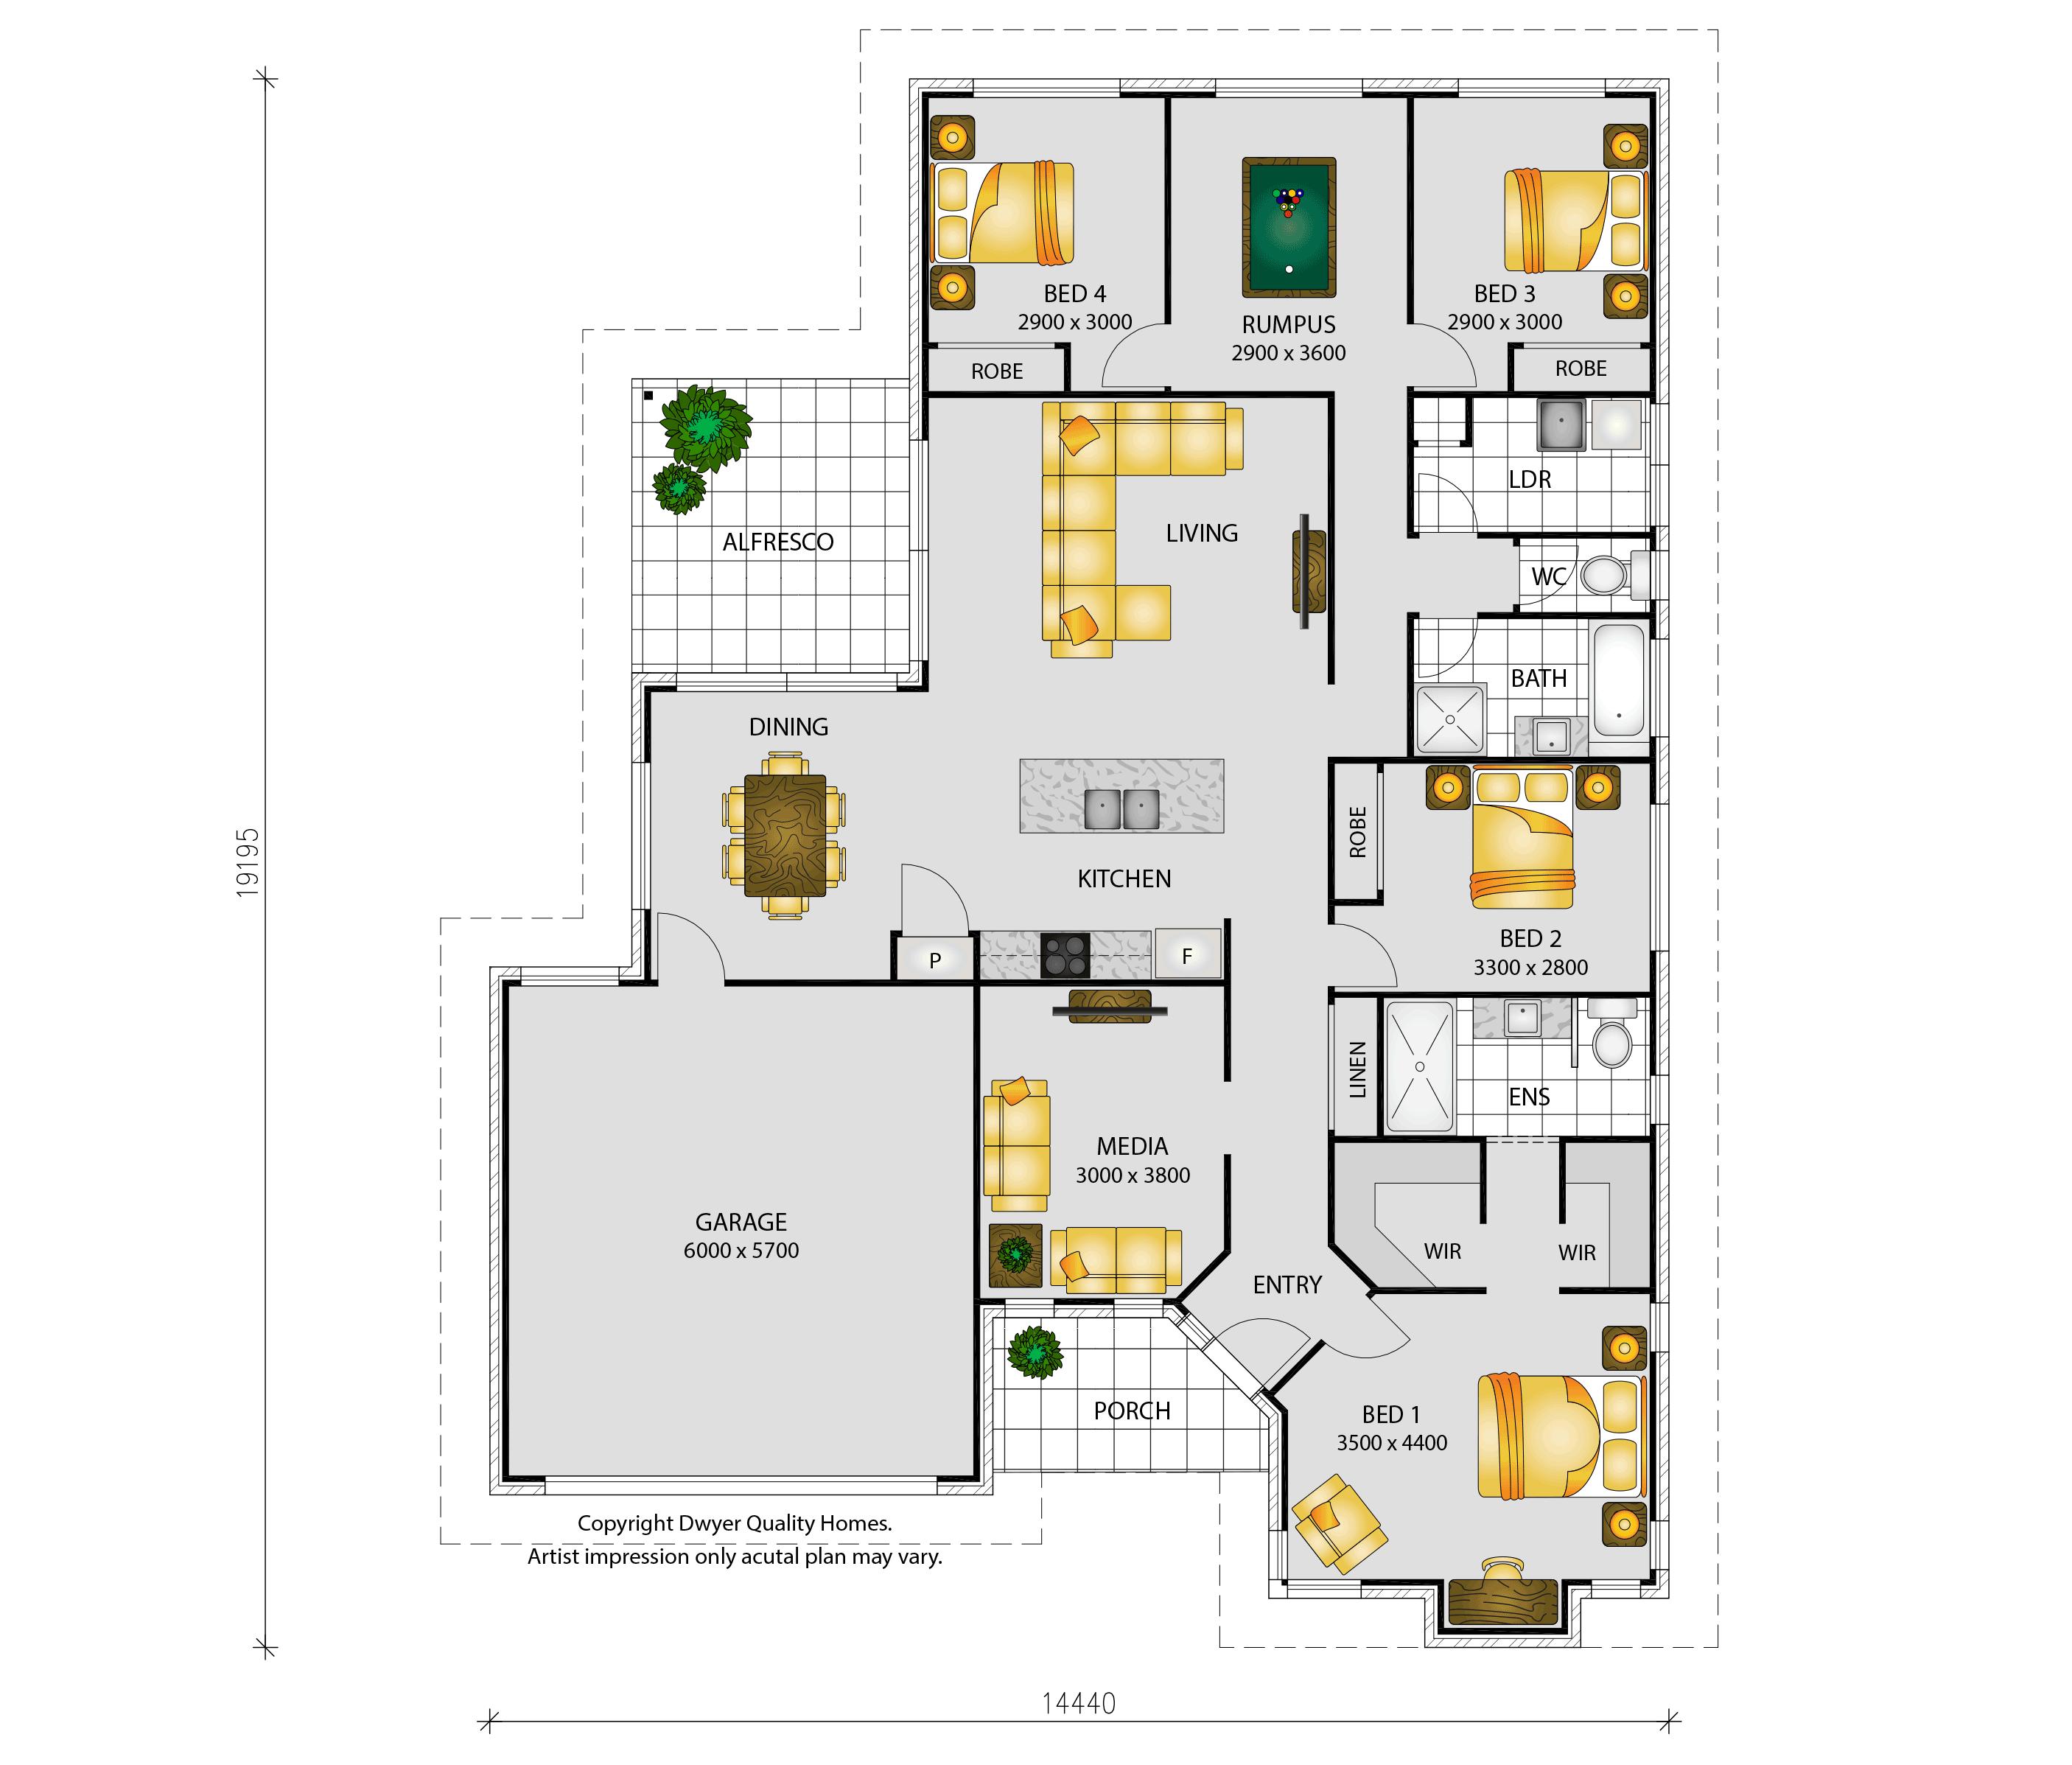 Burleigh MK II - Floorplans